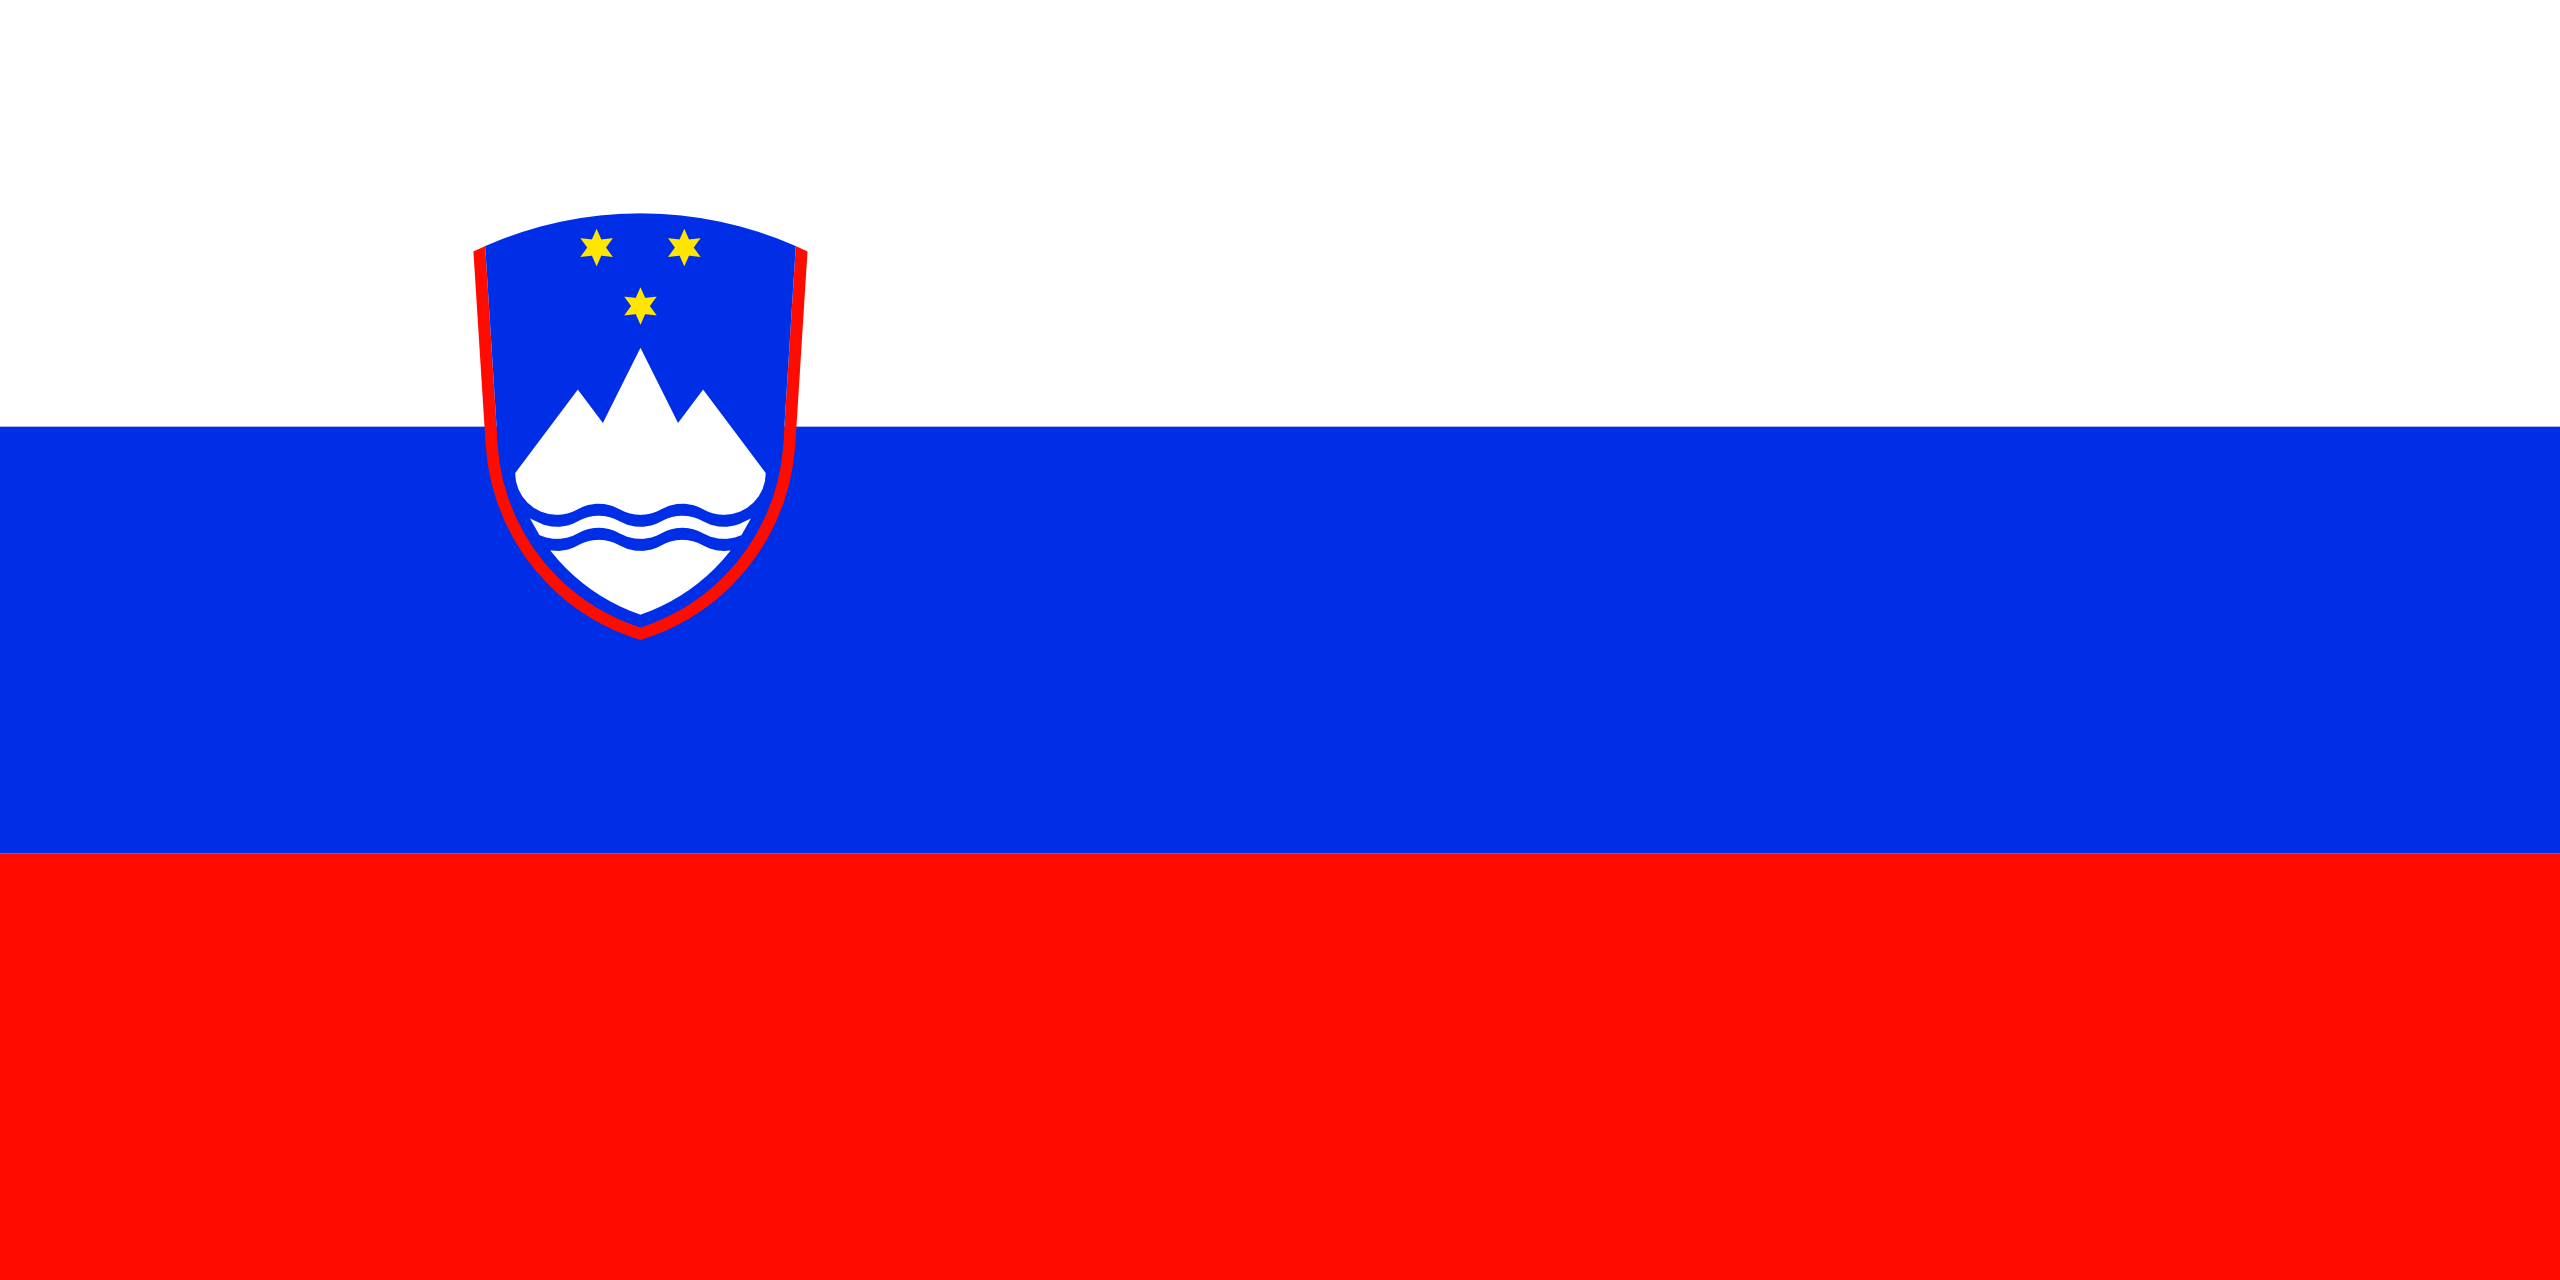 eslovenia, 国家, 会徽, 徽标, 符号 - 高清壁纸 - 教授-falken.com